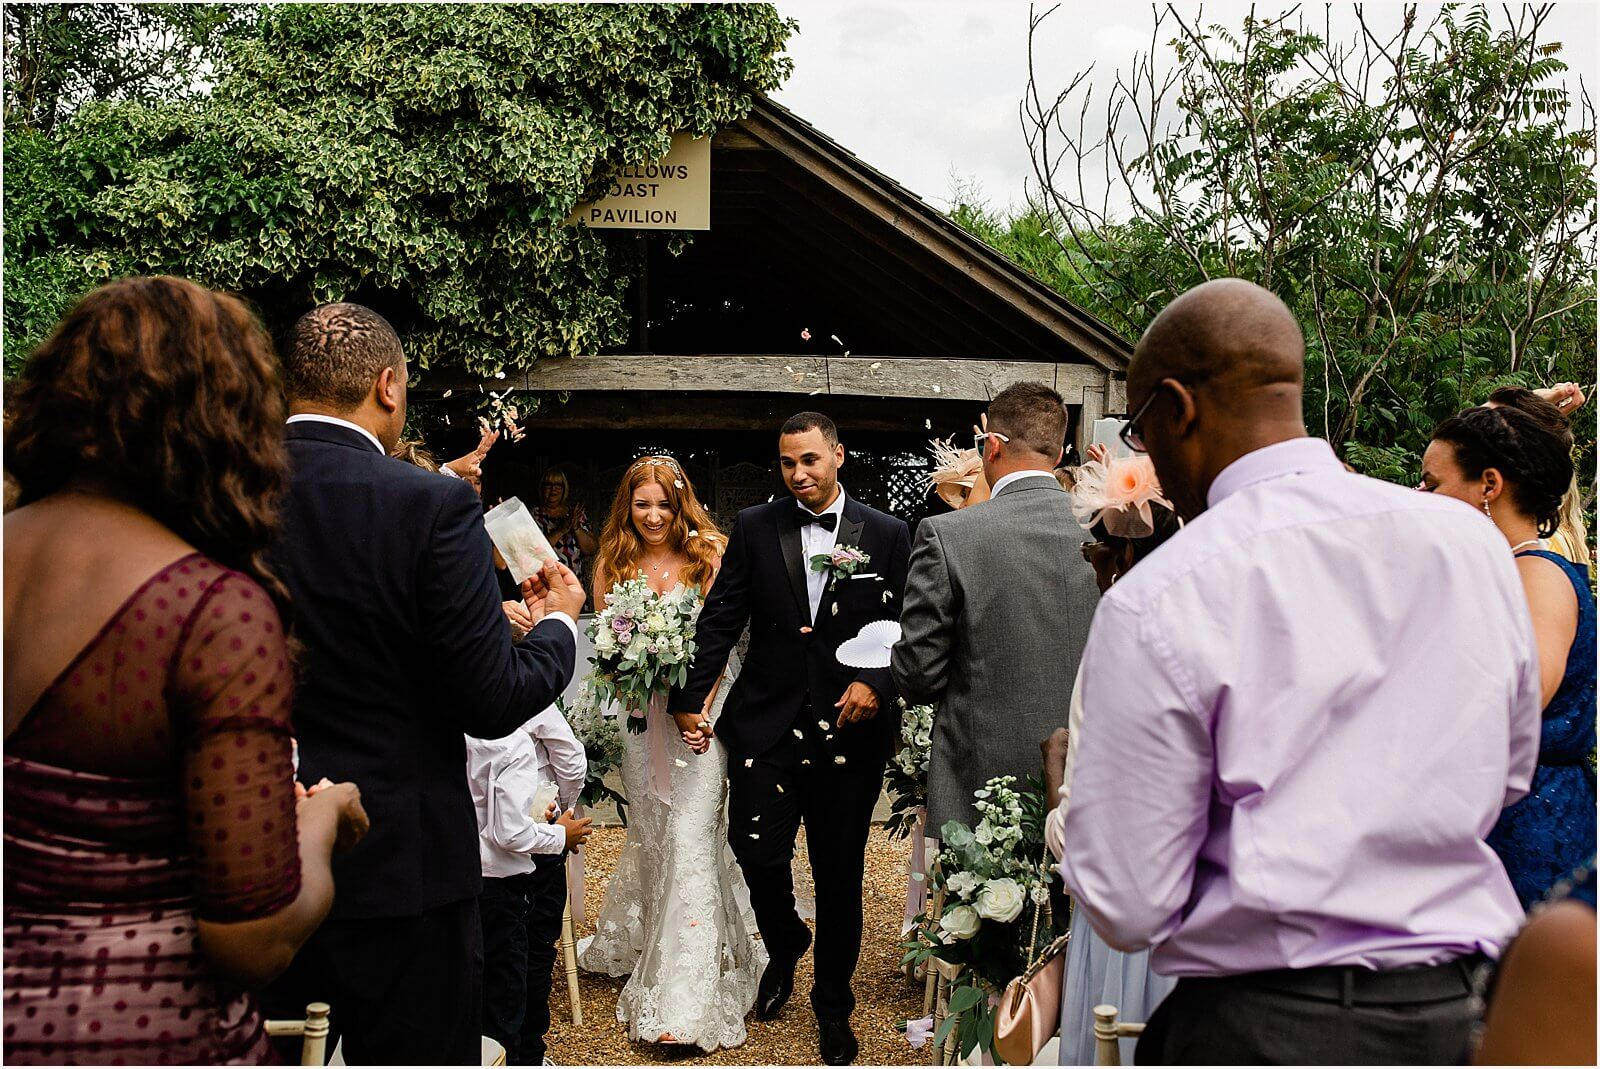 Swallows Oast Wedding - Jakki + Luke's barn wedding photography 30